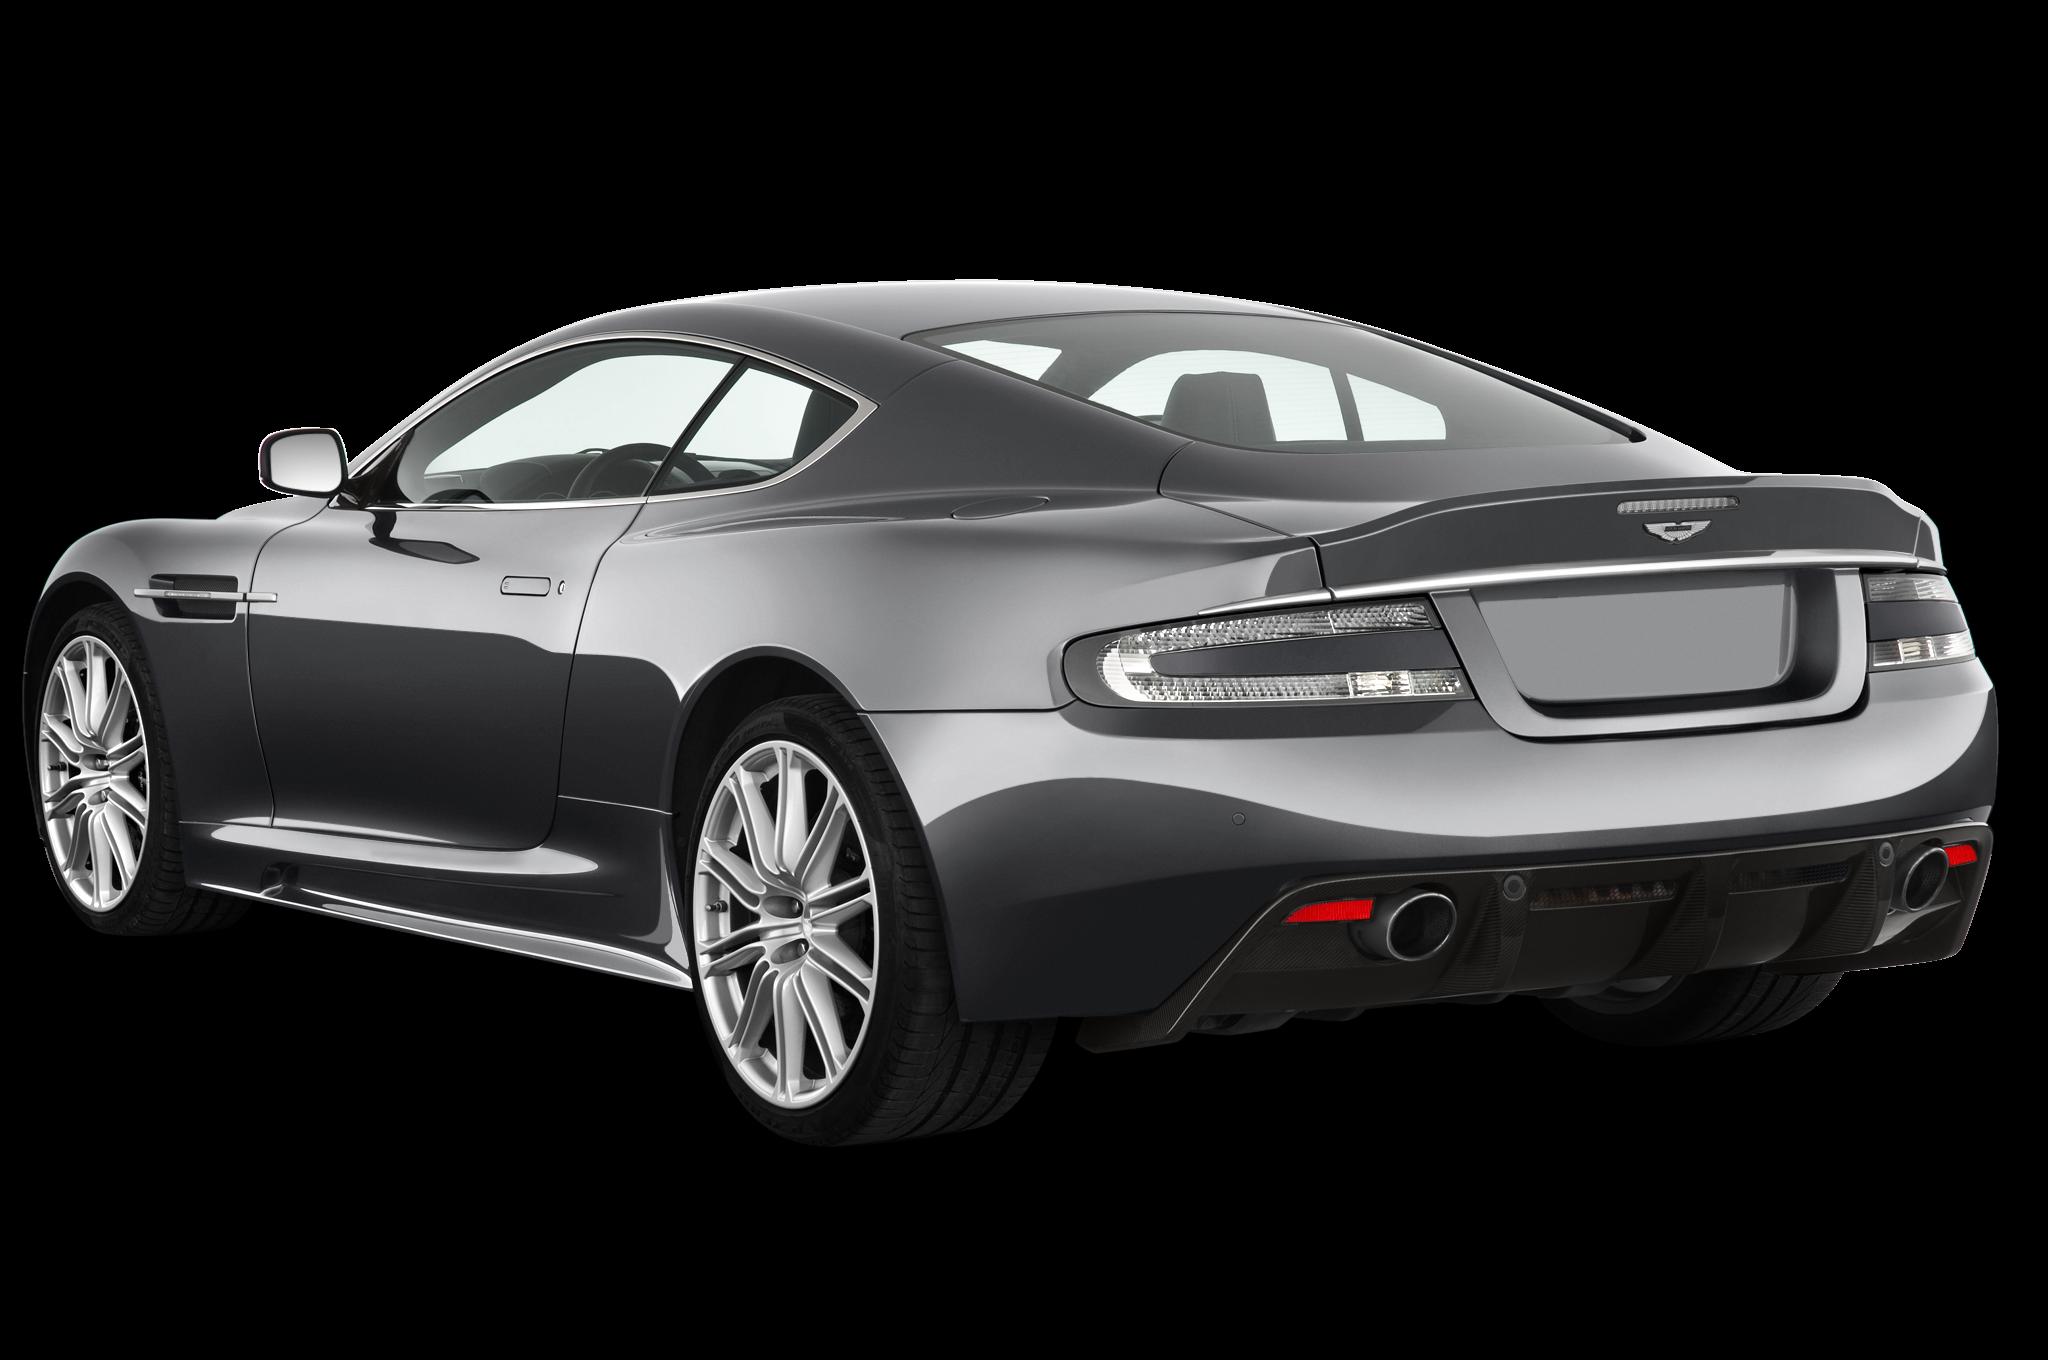 Aston Martin DBS 2011 - International Price & Overview